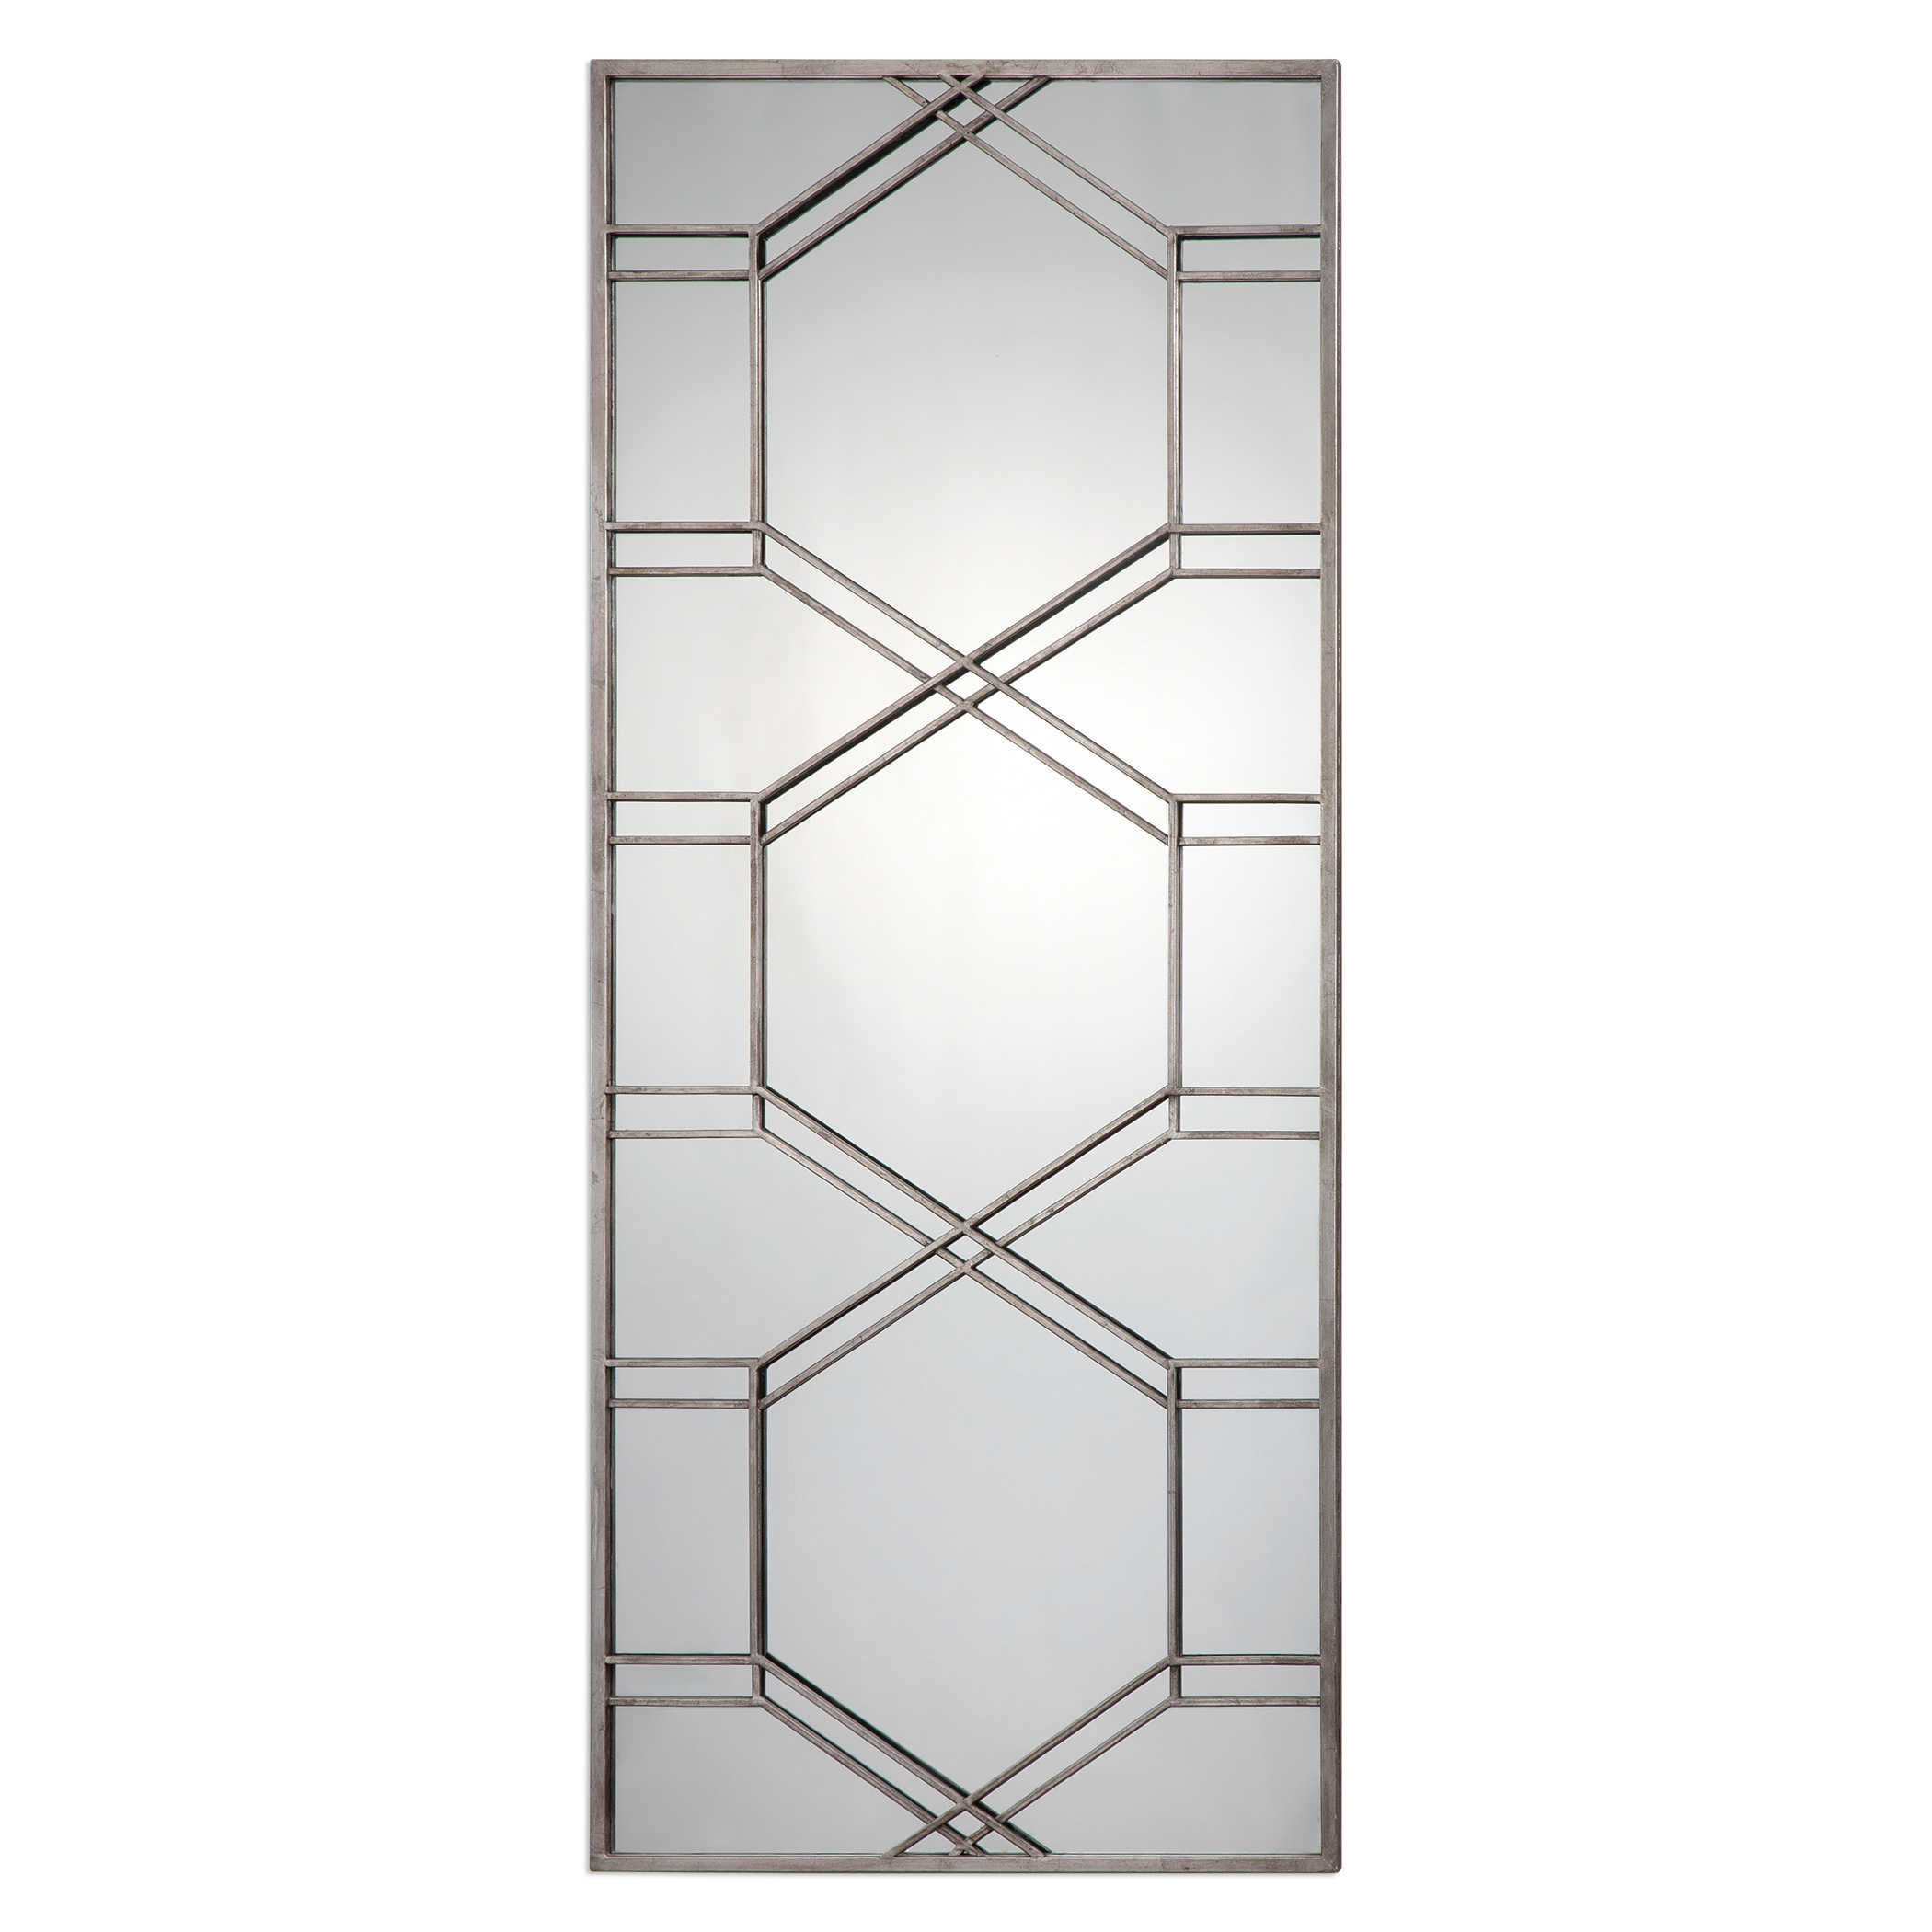 Feyock Mirror-$835.00